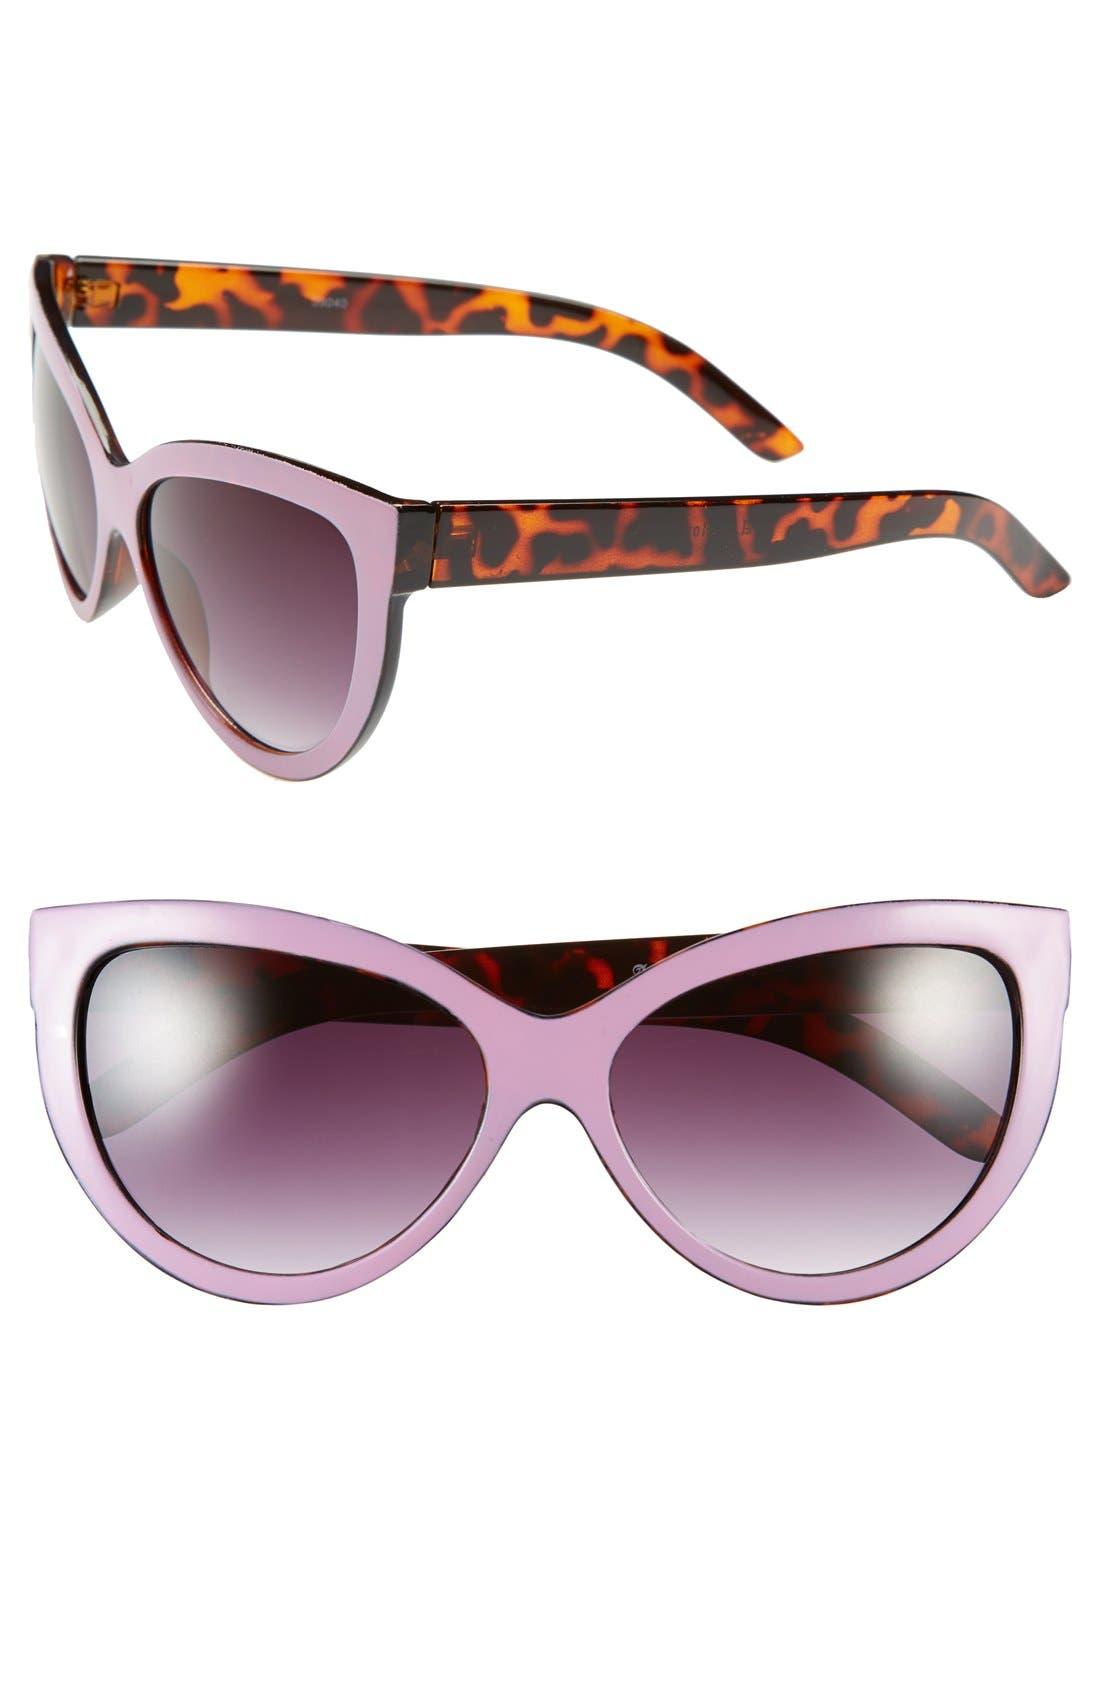 Alternate Image 1 Selected - A.J. Morgan 'Love Story' 57mm Cat Eye Sunglasses